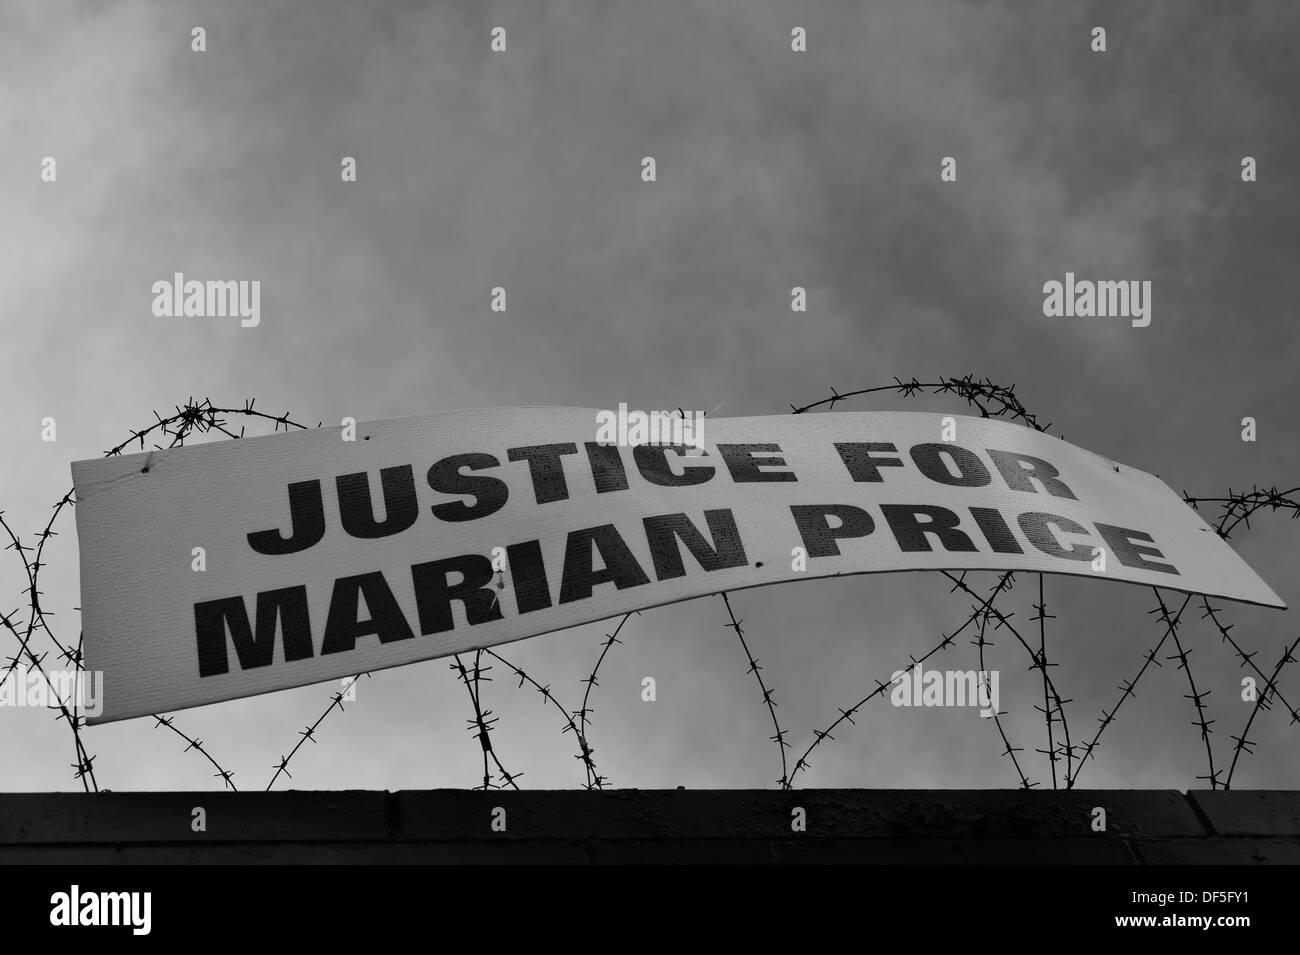 International Wall, West Belfast, UK. - Stock Image